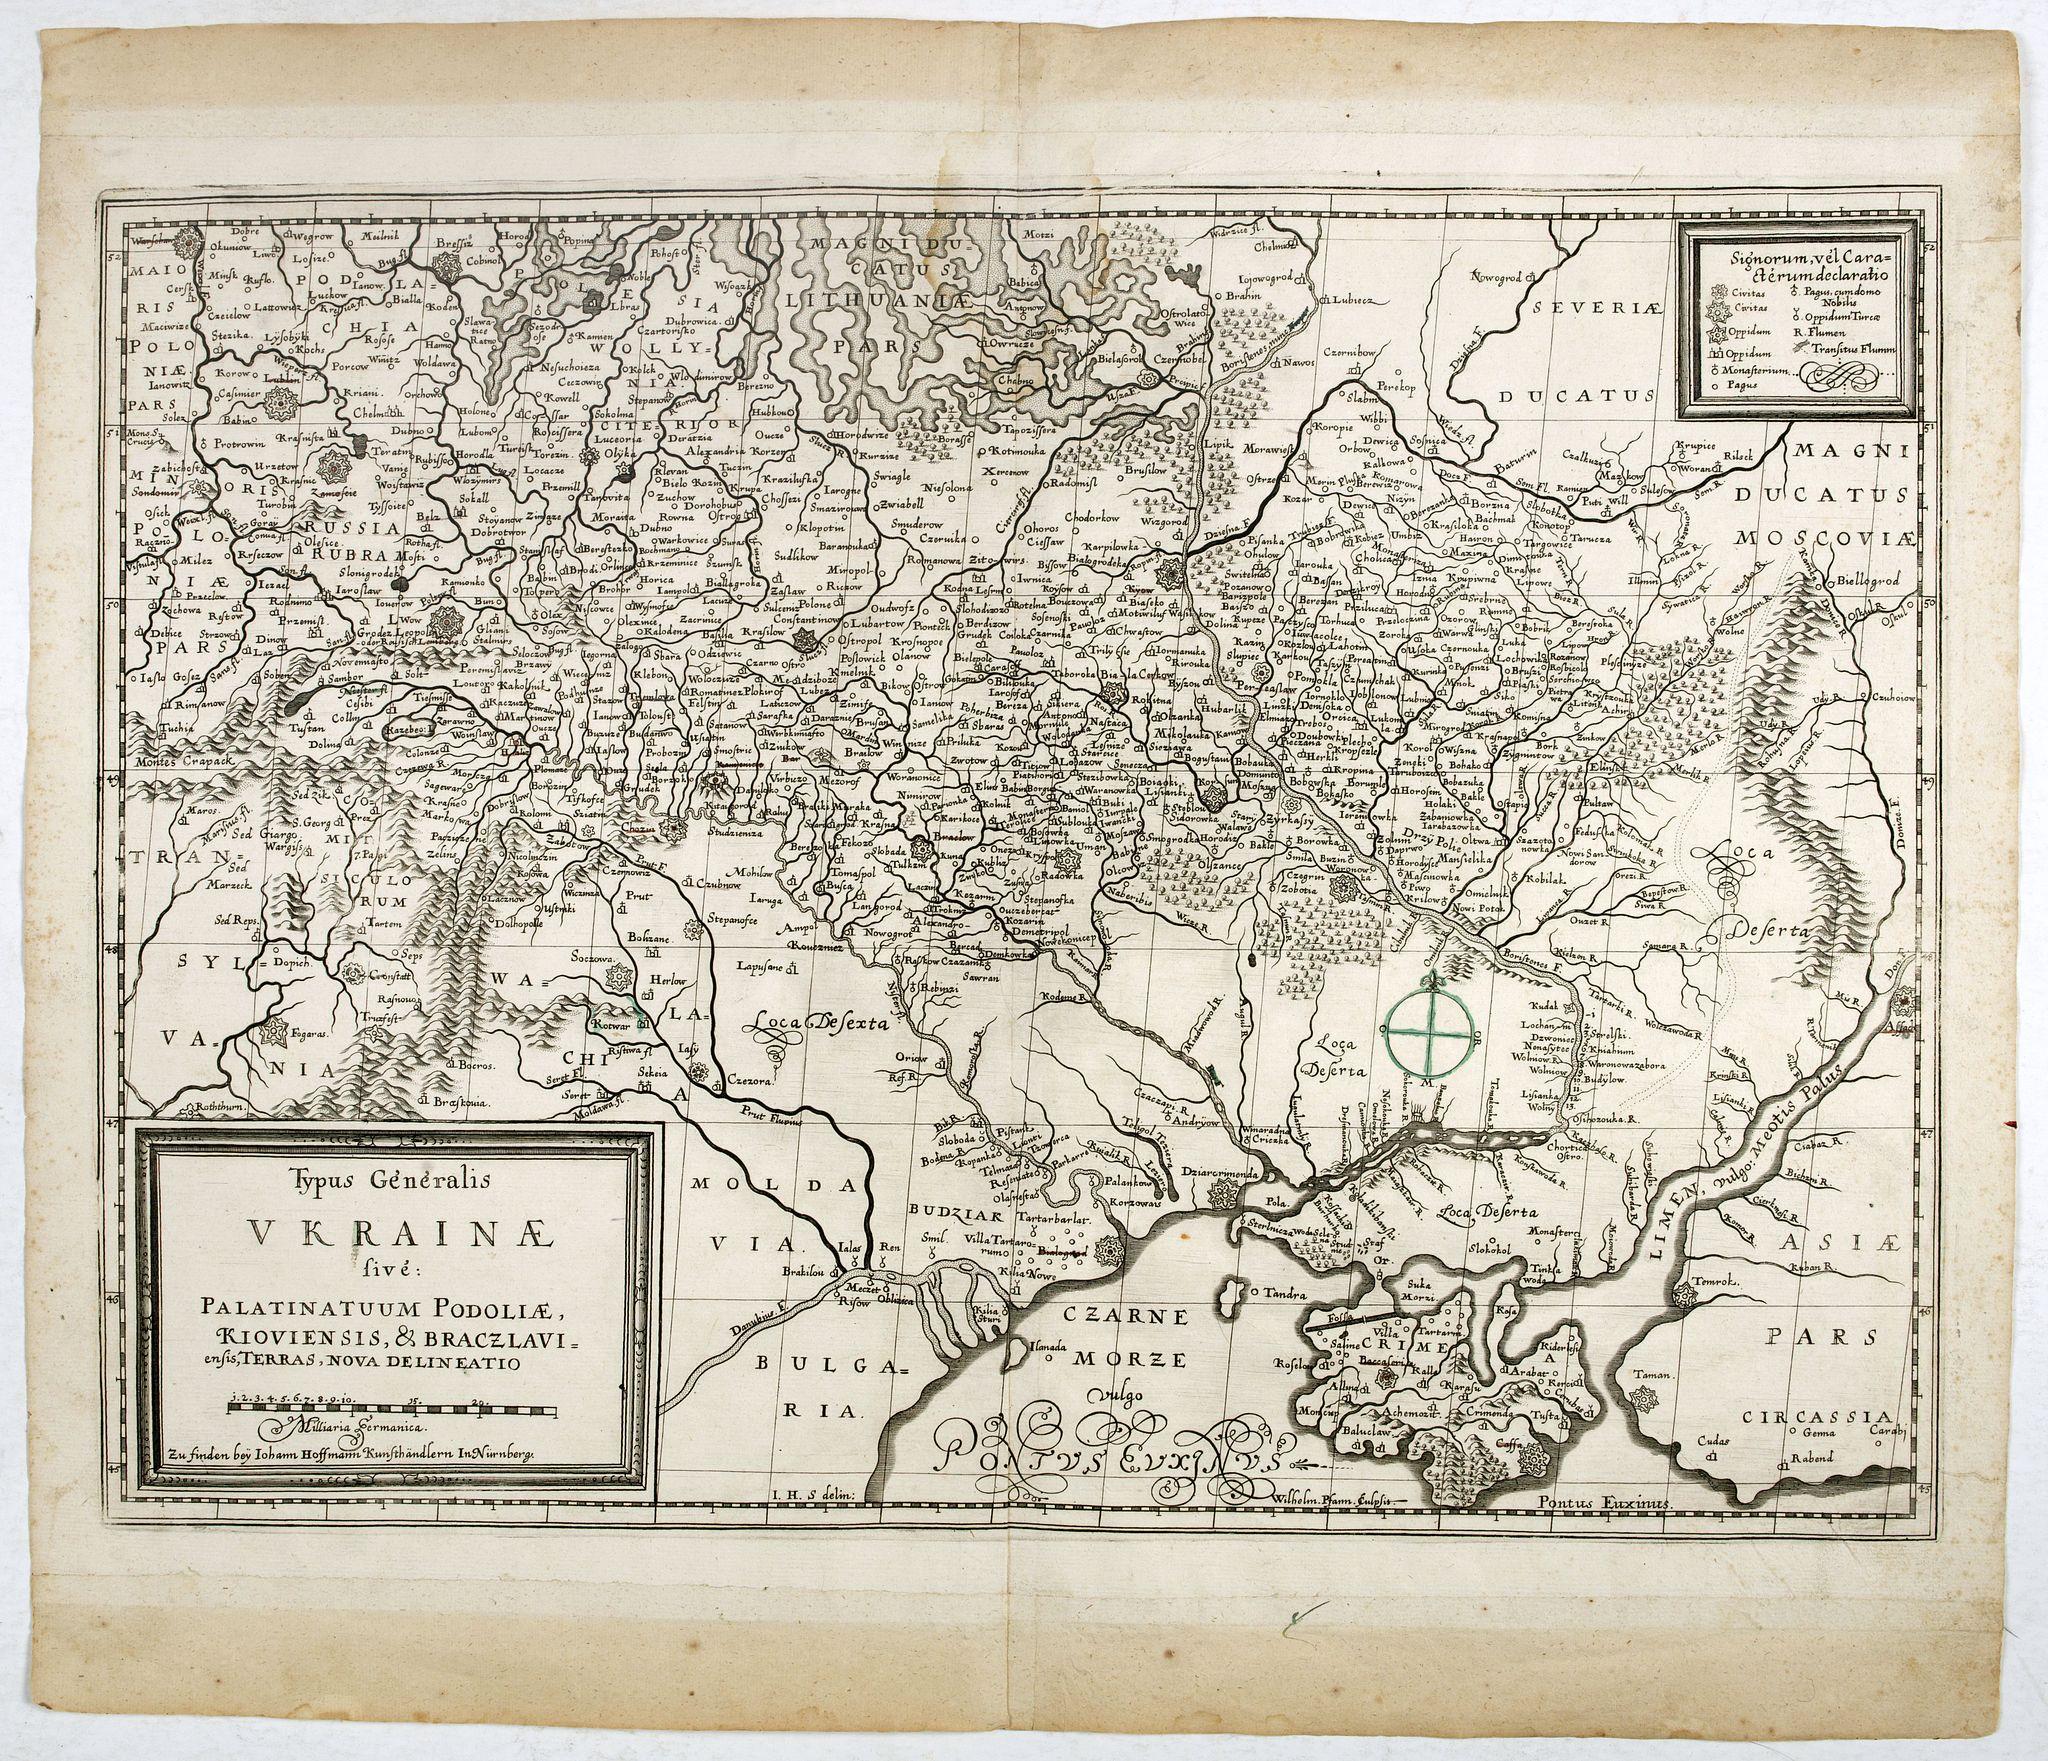 GUILLAUME DE BEAUPLAN / HOFFMAN, J. -  Typus Generalis Ukrainae sive Palatinatuum Podoliae, Kioviensis et Braczlaviensis terras nova delineatione exhibens. . .